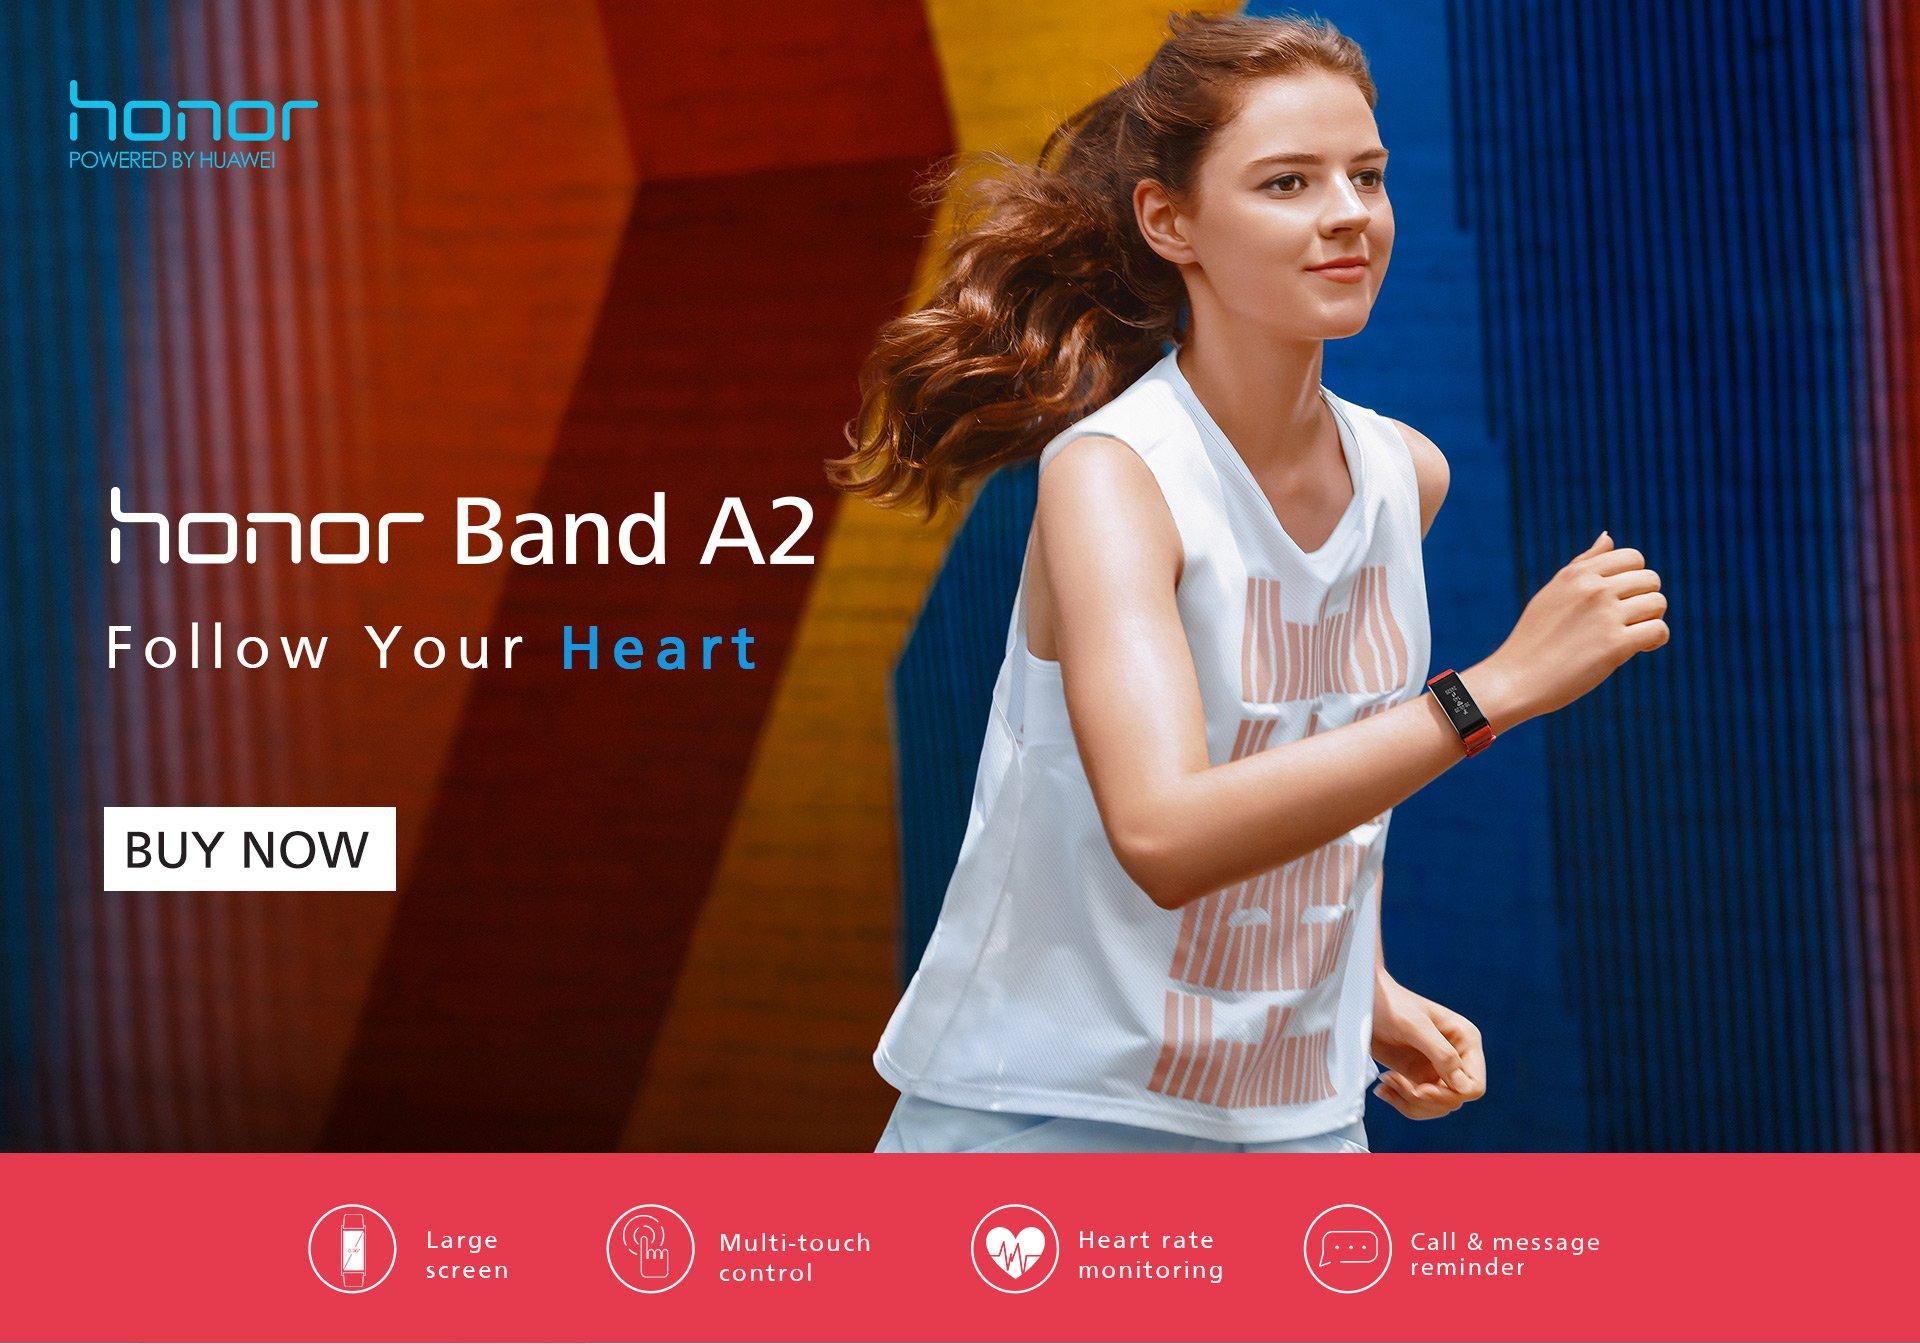 Honor Band A2